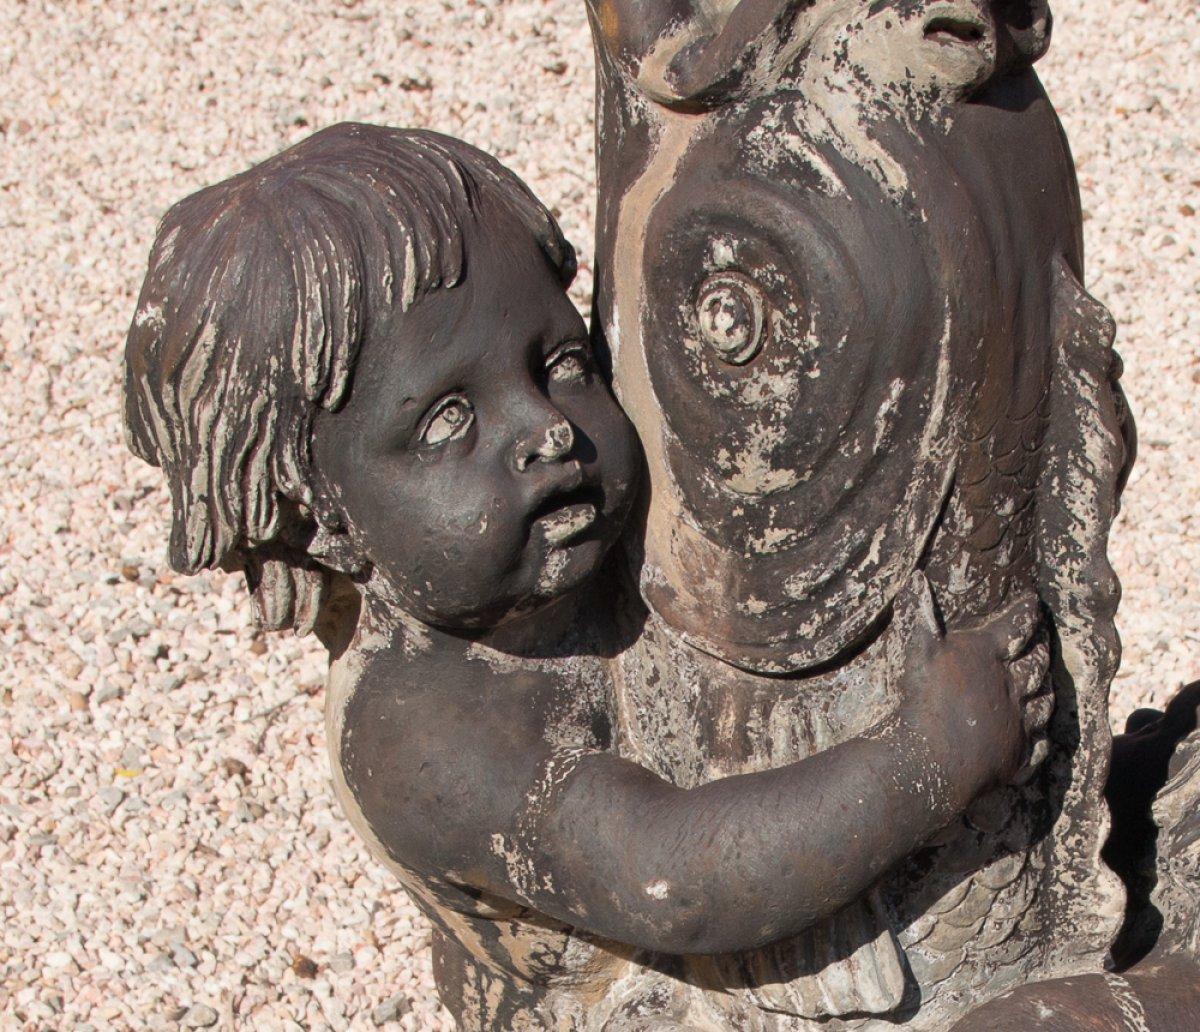 Fontaine en plomb putti et dauphin poque xviiie si cle for Jardin xviiie siecle